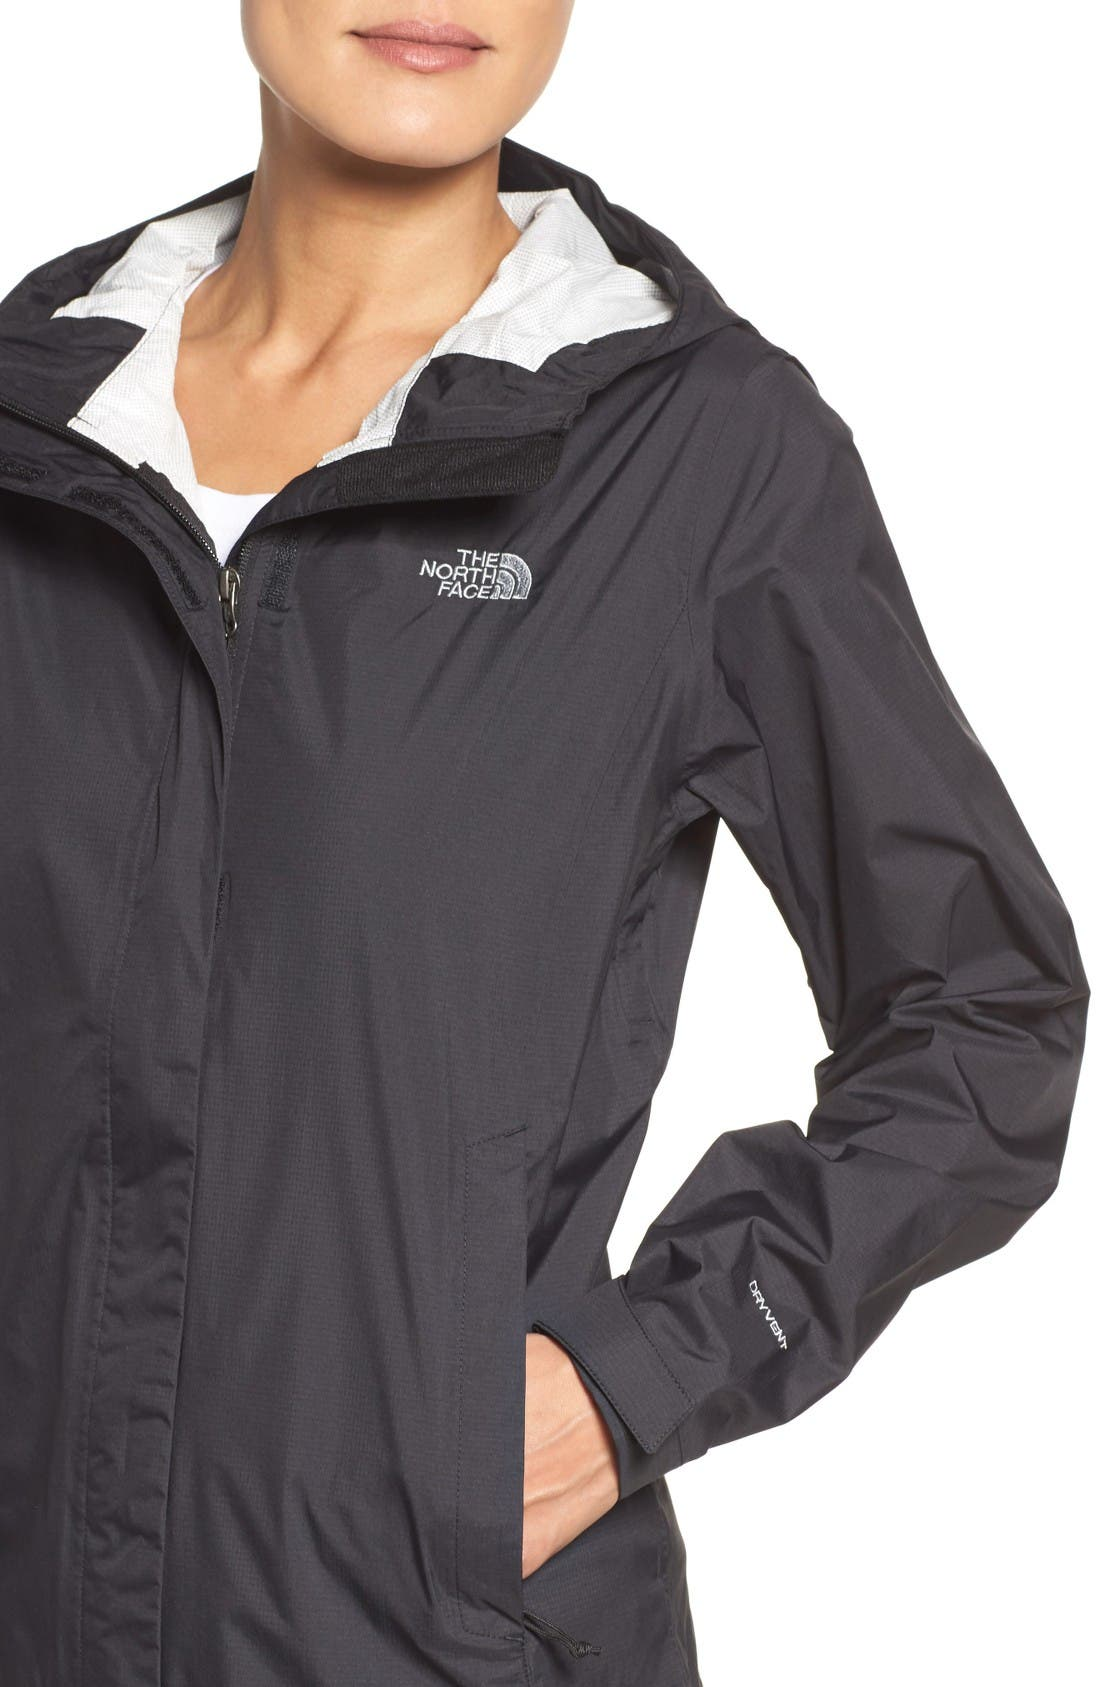 Venture 2 Waterproof Jacket,                             Alternate thumbnail 4, color,                             Tnf Black